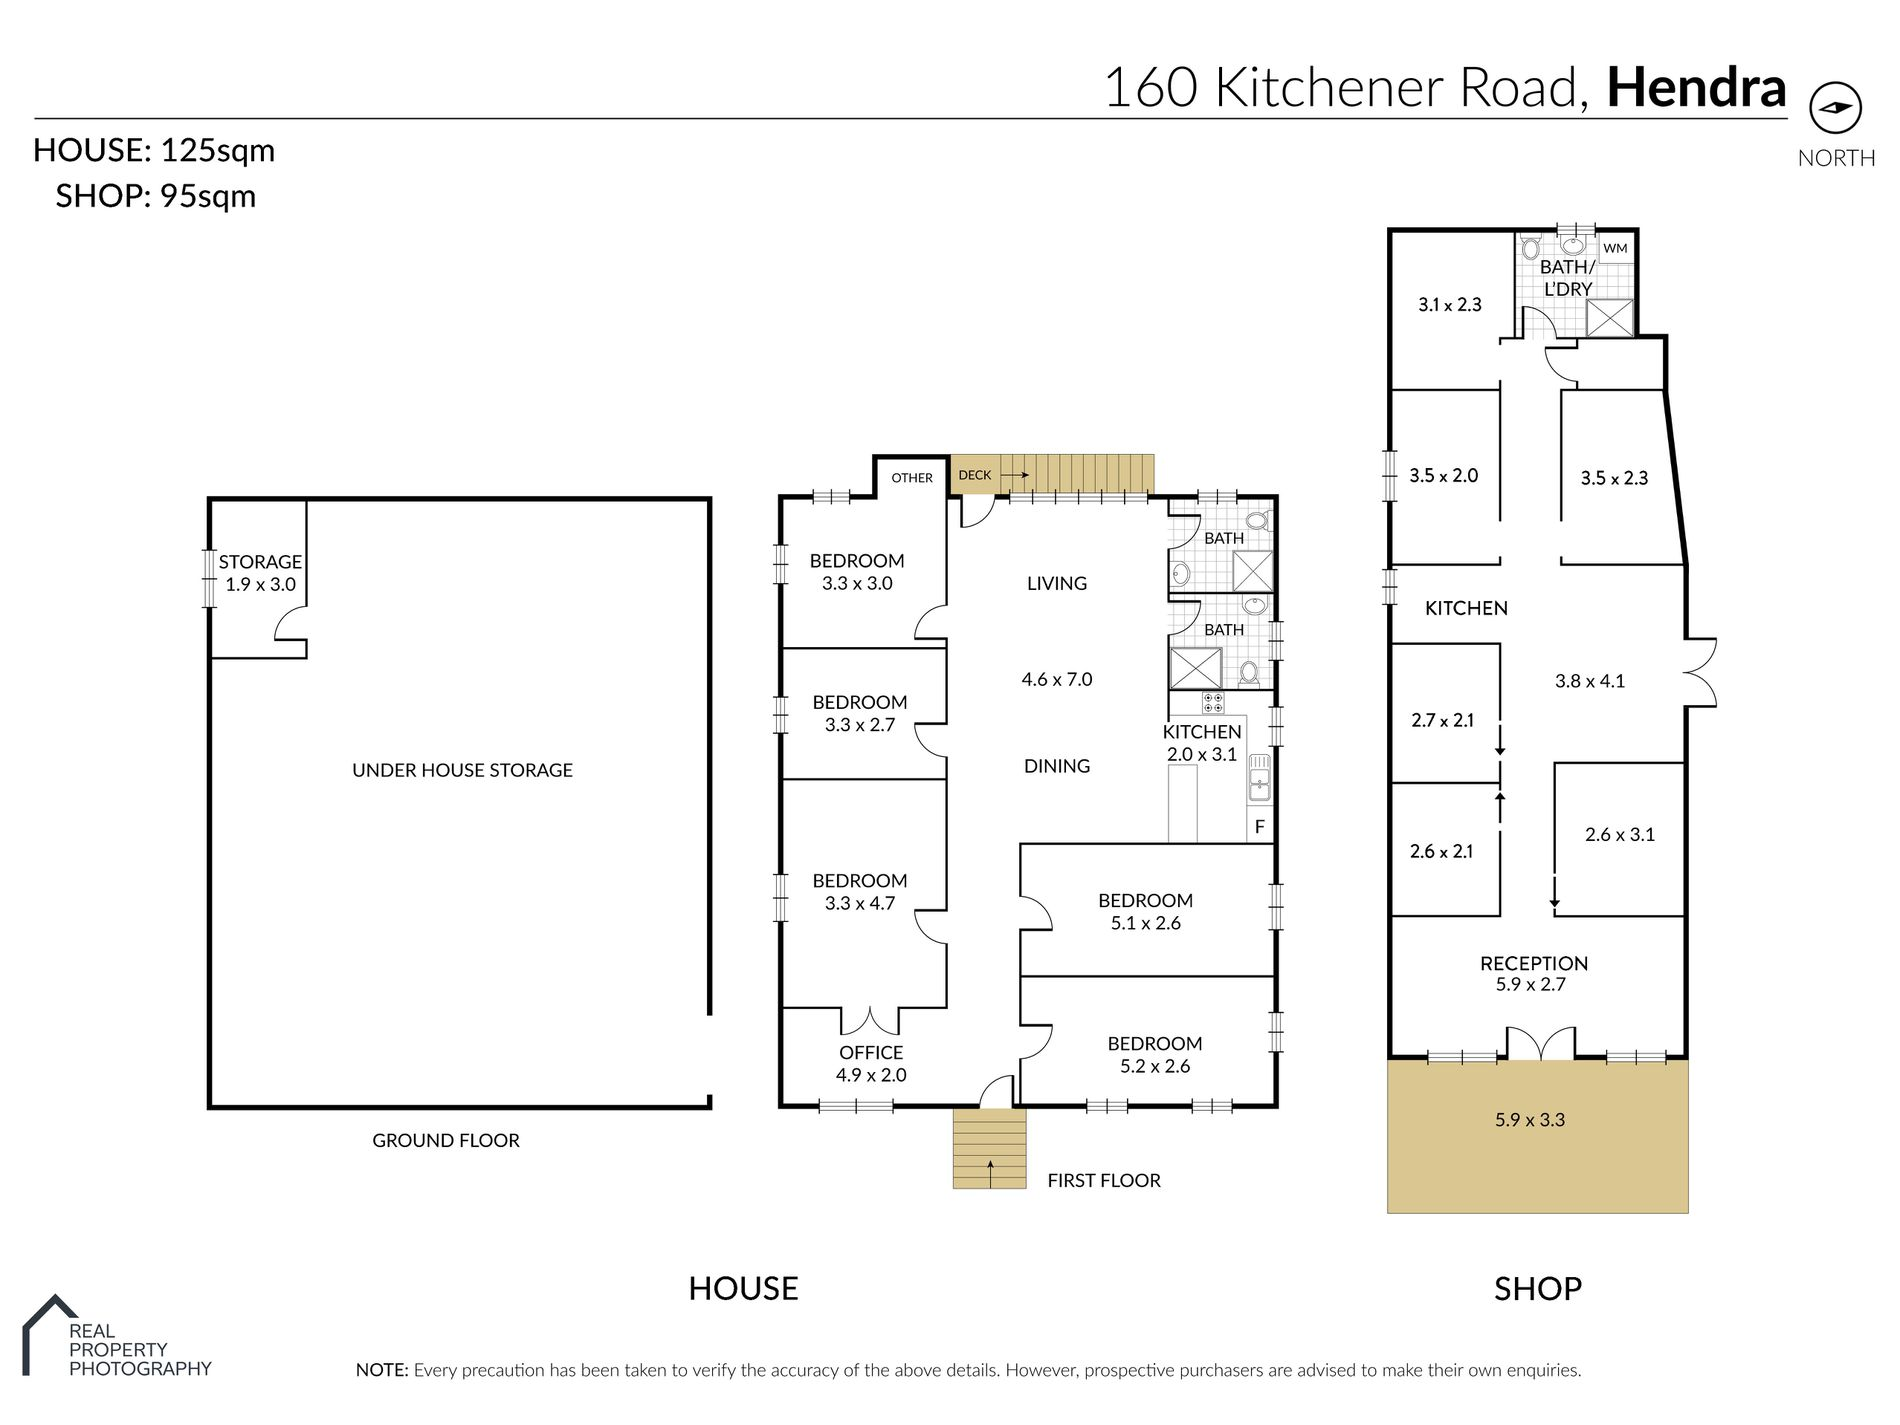 160 Kitchener Road, Hendra